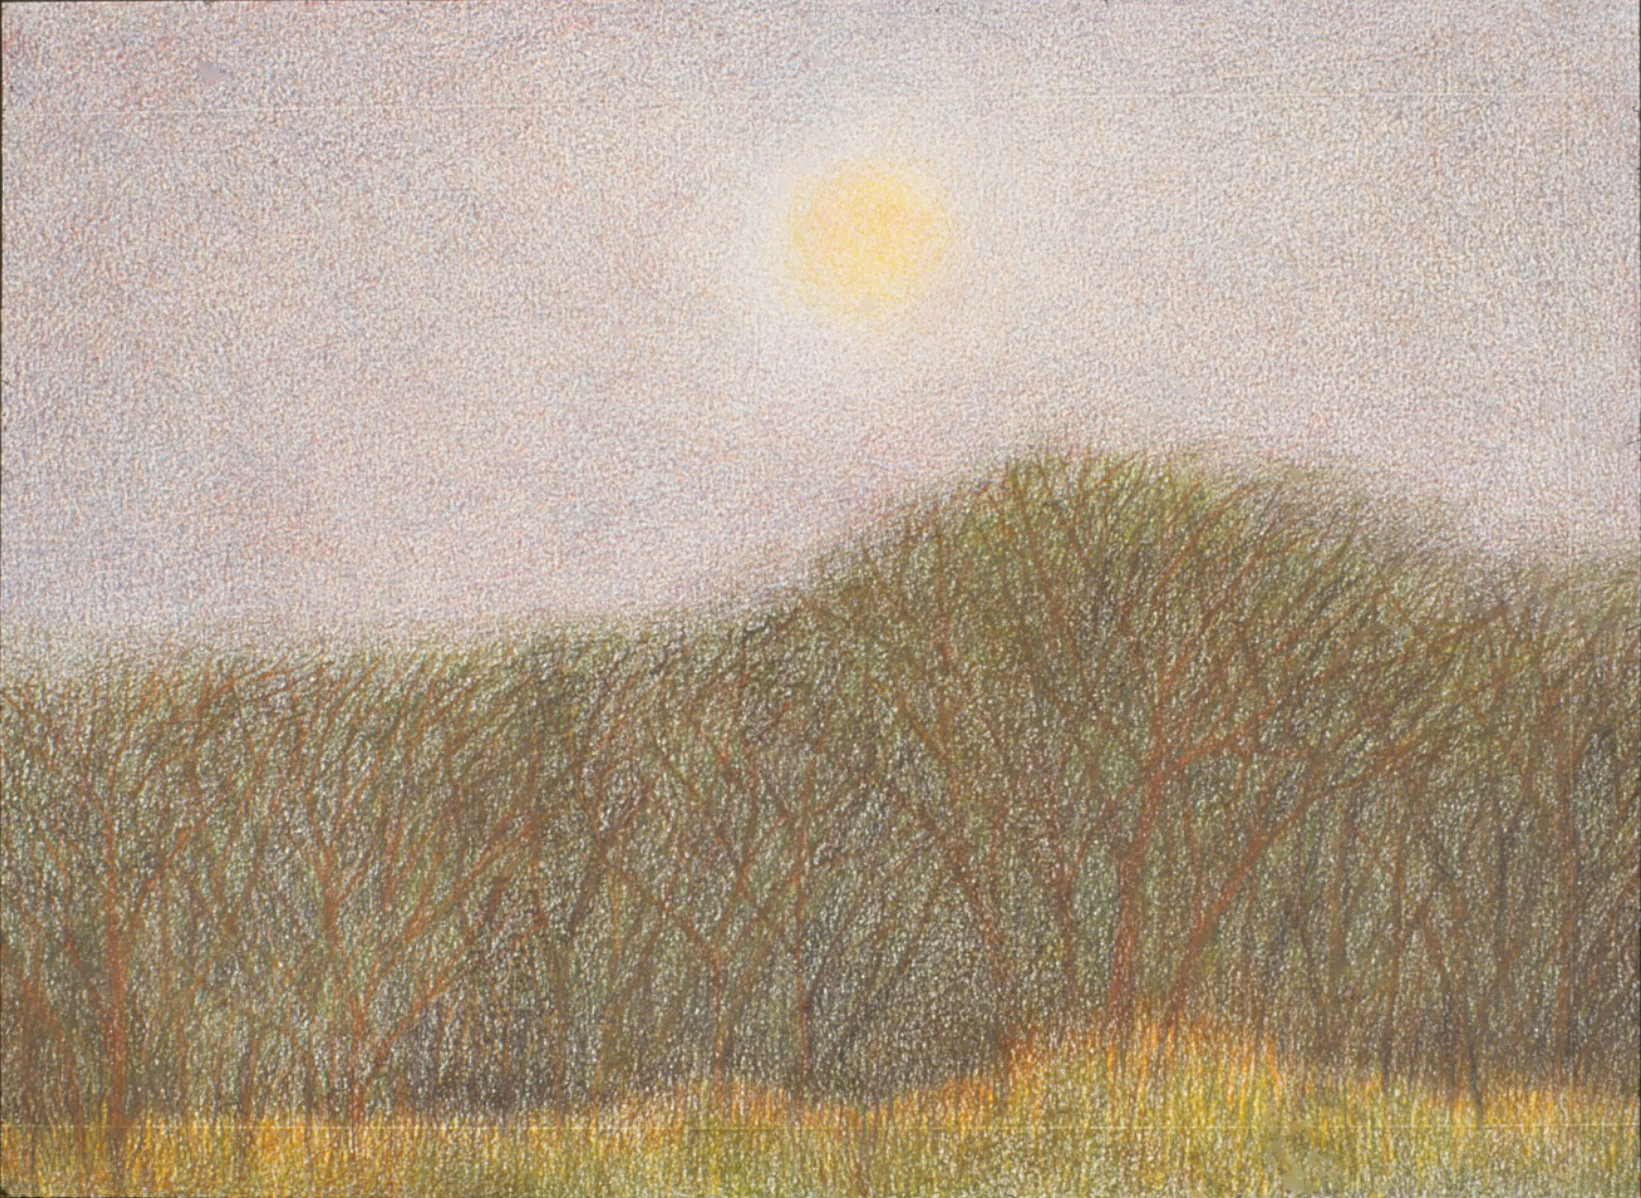 Early Moon (2)